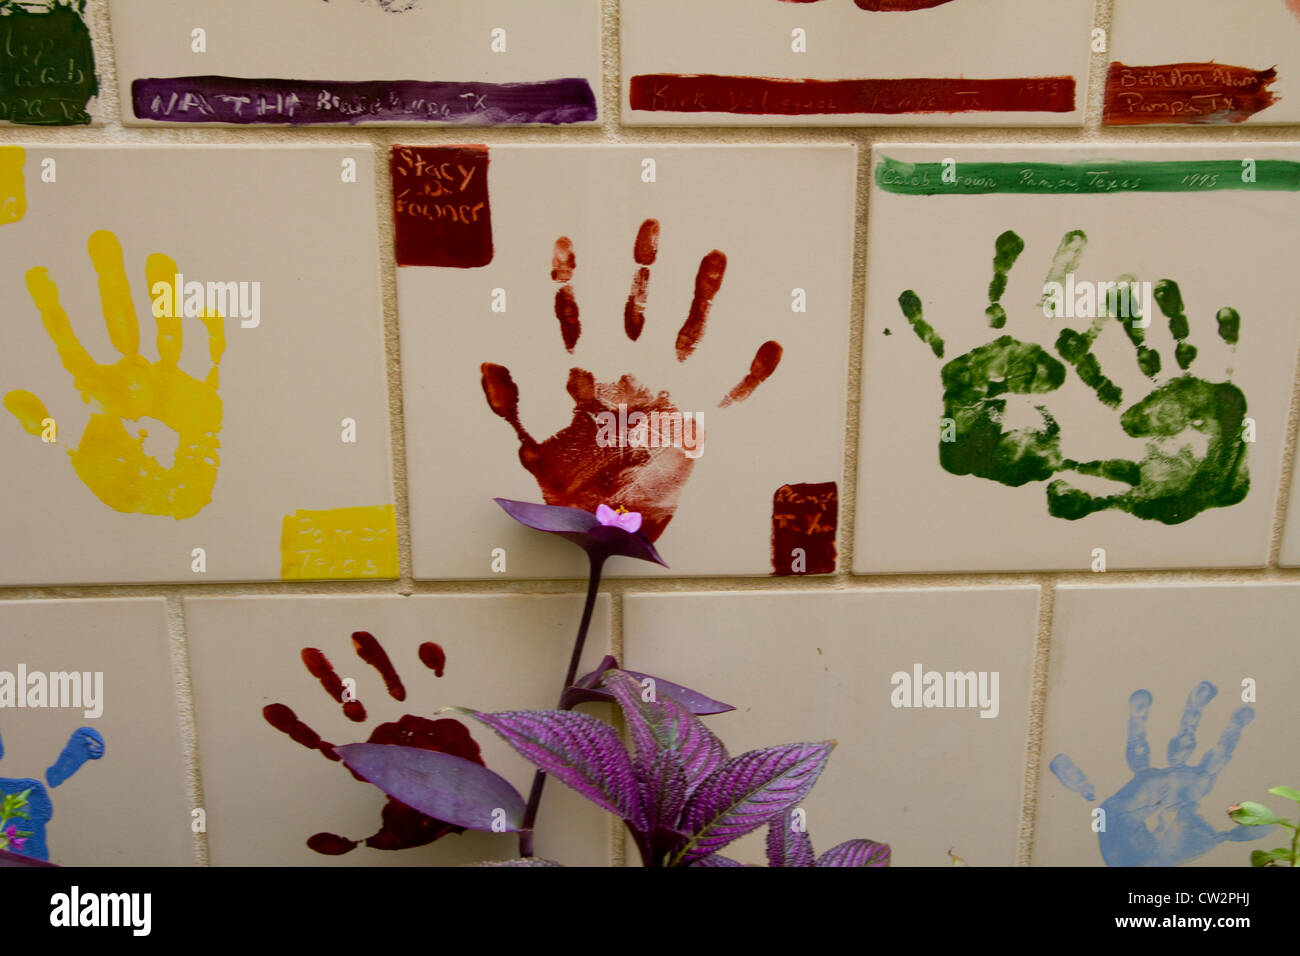 Childrens Tiles Imágenes De Stock & Childrens Tiles Fotos De Stock ...